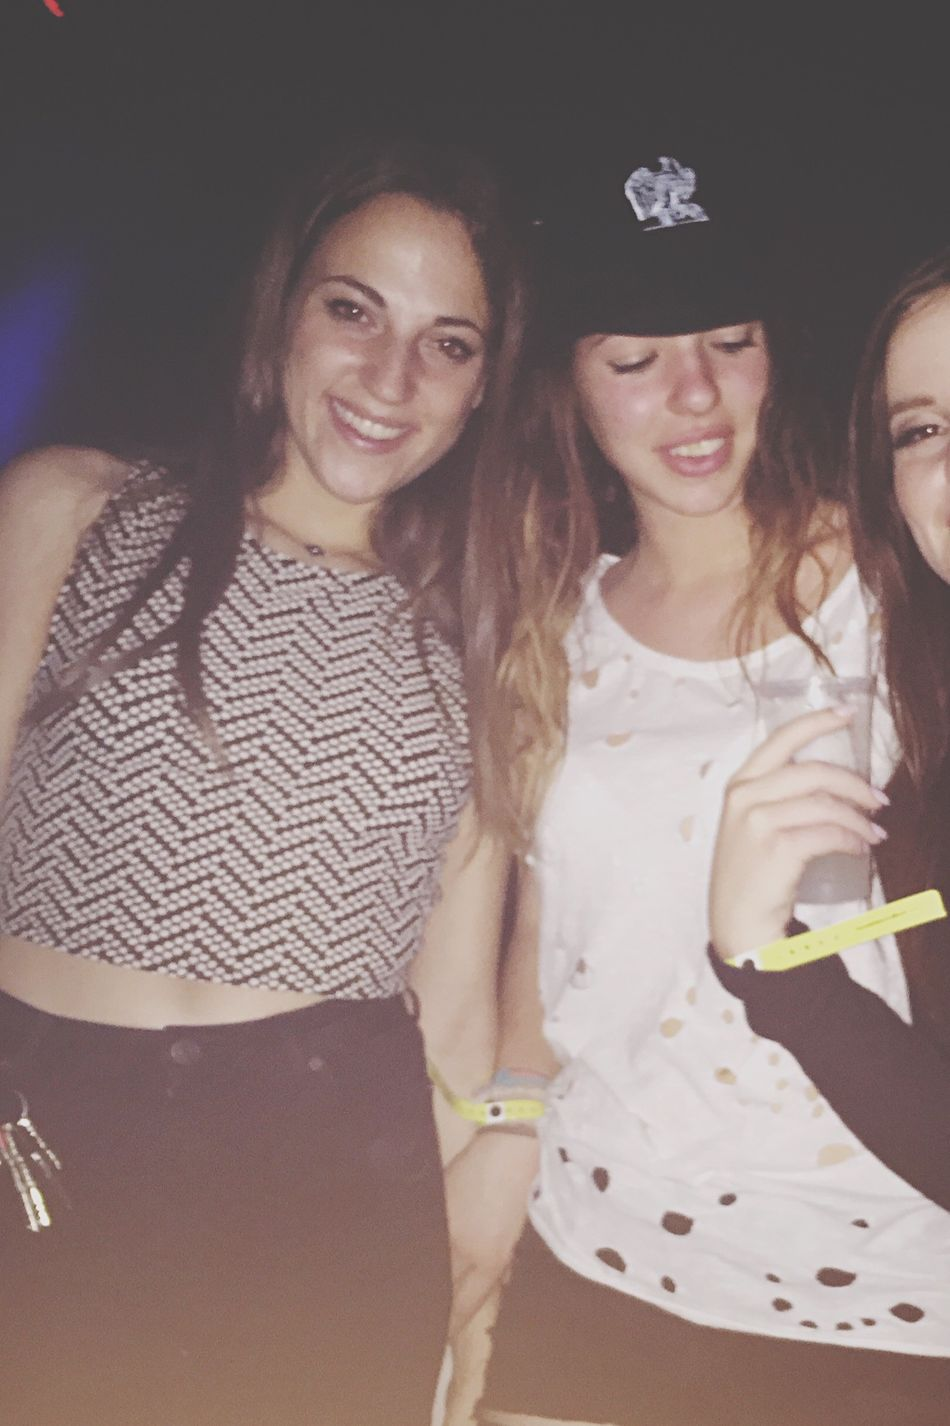 Always Bestfriends Siamosolonoi Dancing Enjoying Life Happiness 👭❤️